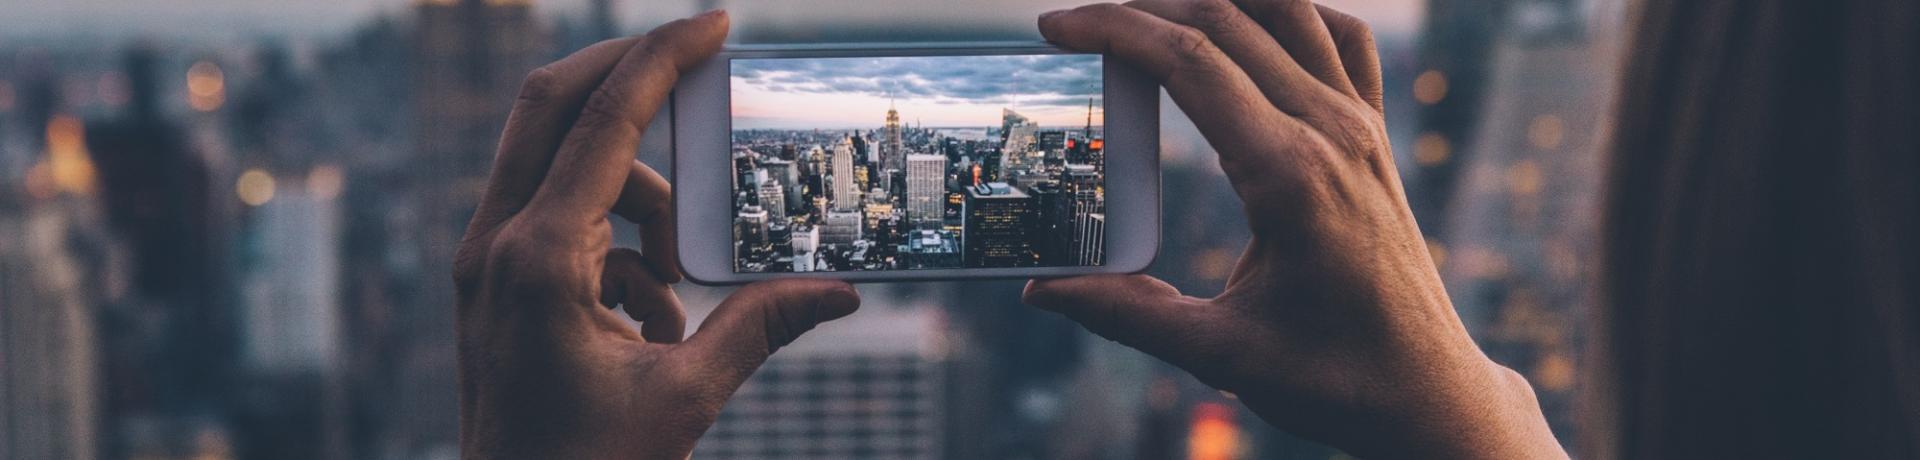 Sonstiges: Smartphone Foto New York